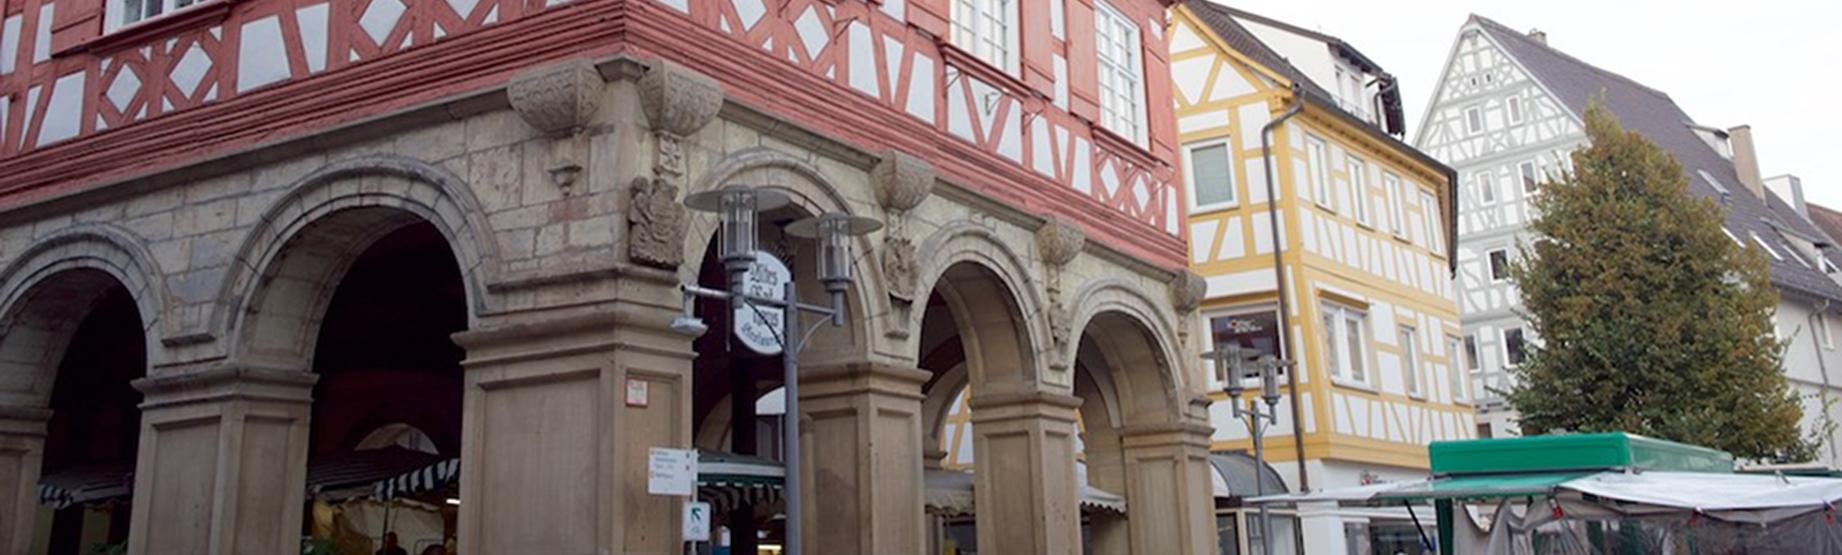 Waiblinger Marktplatz